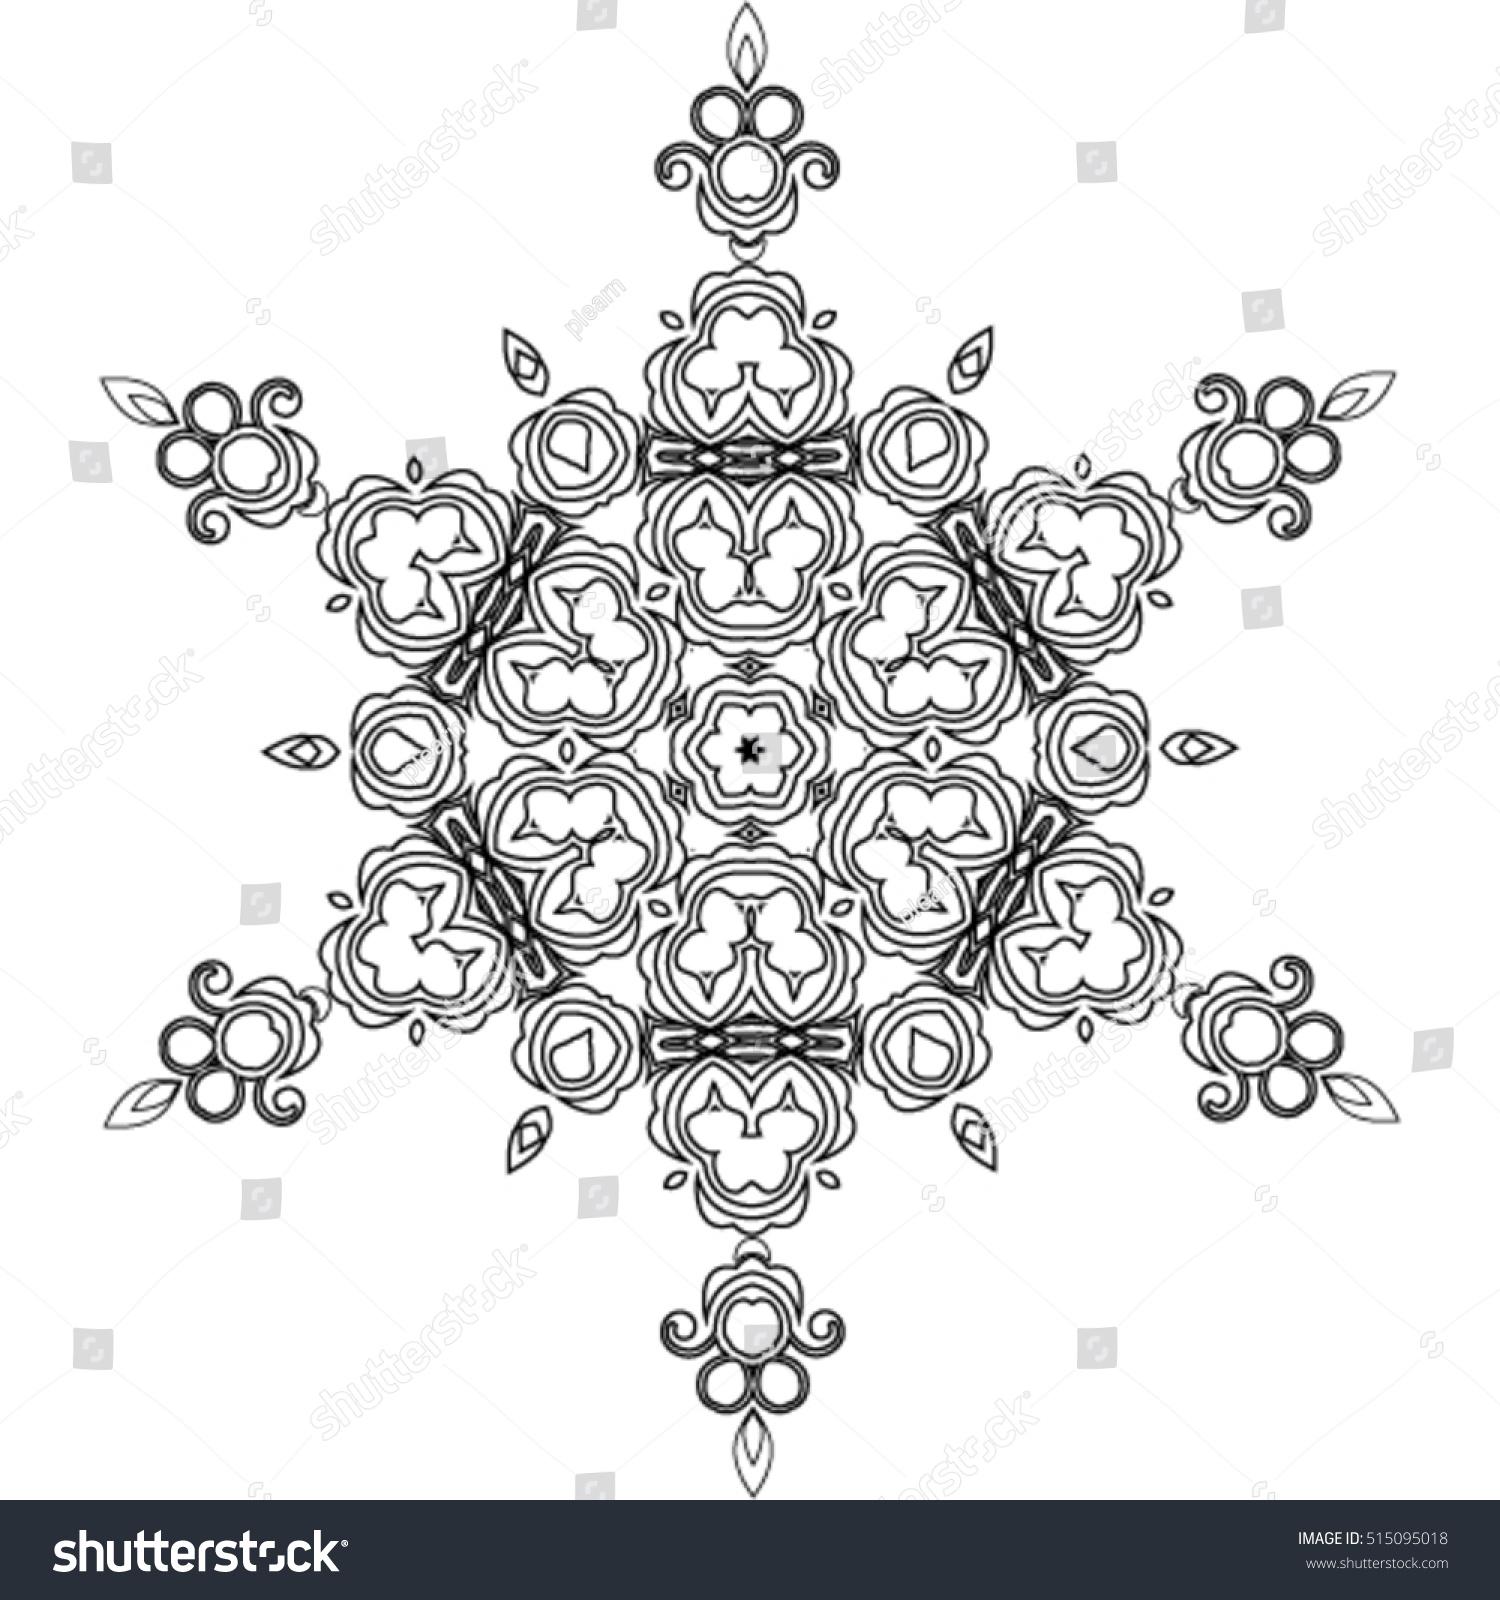 abstract mandala snowflake line art design stock vector 515095018